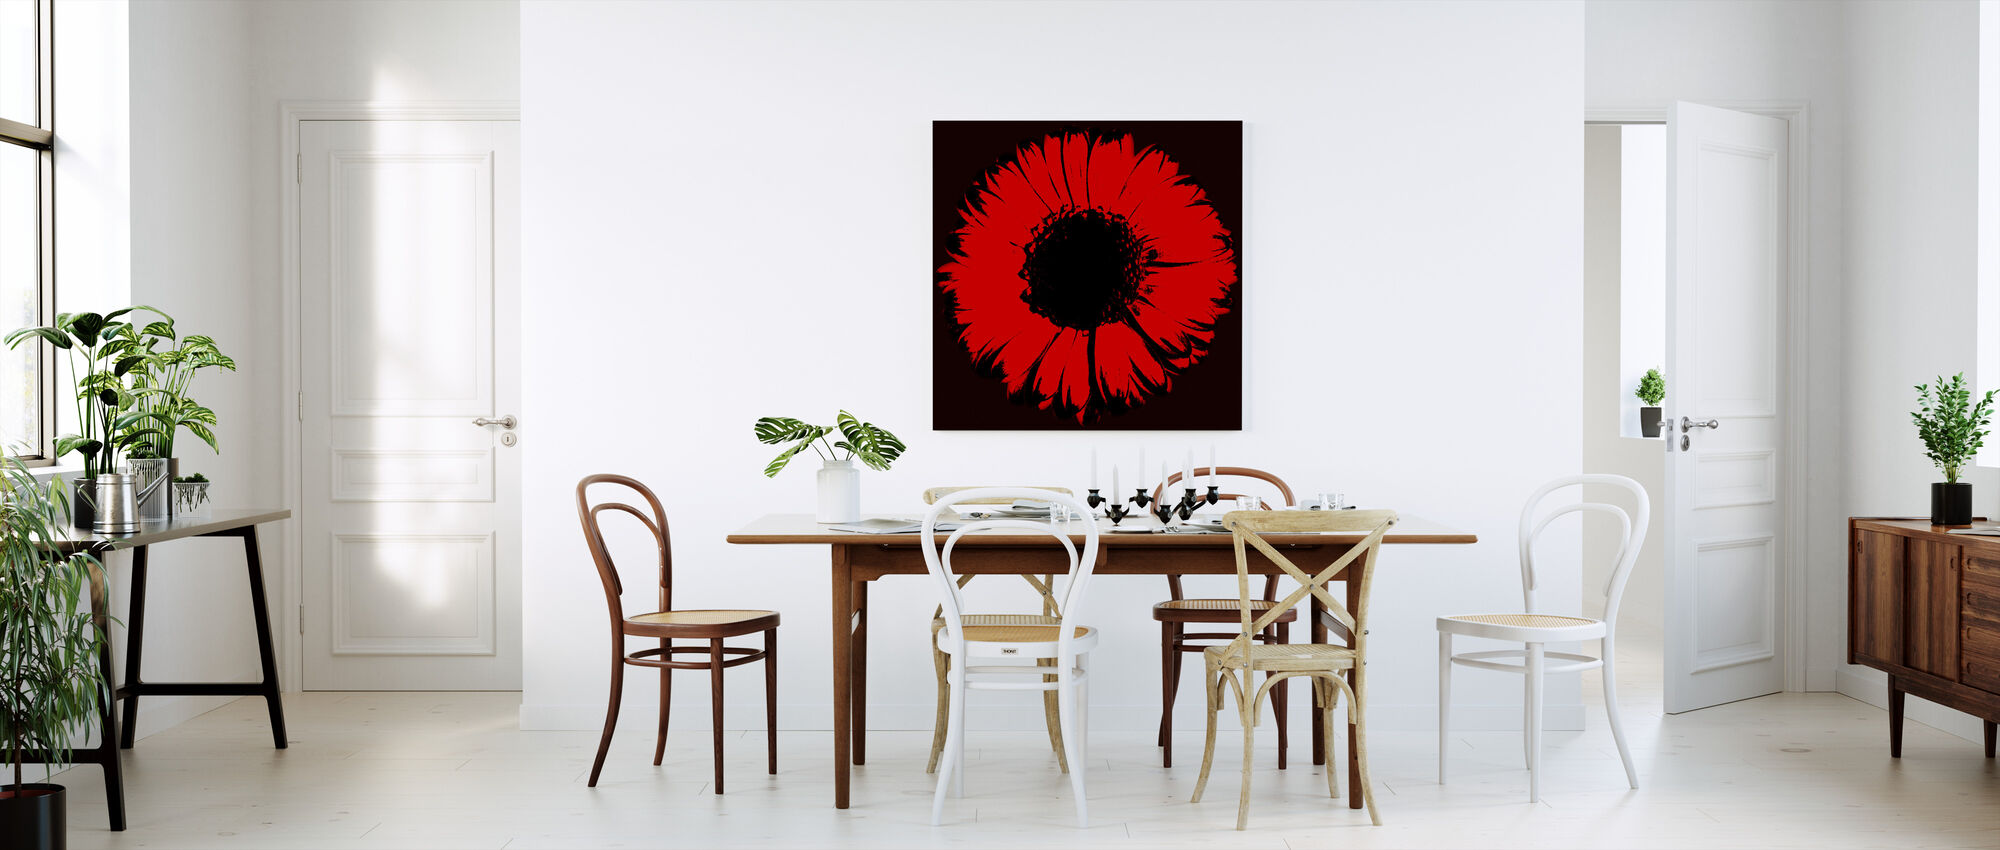 Rode Gerbera - Canvas print - Keuken